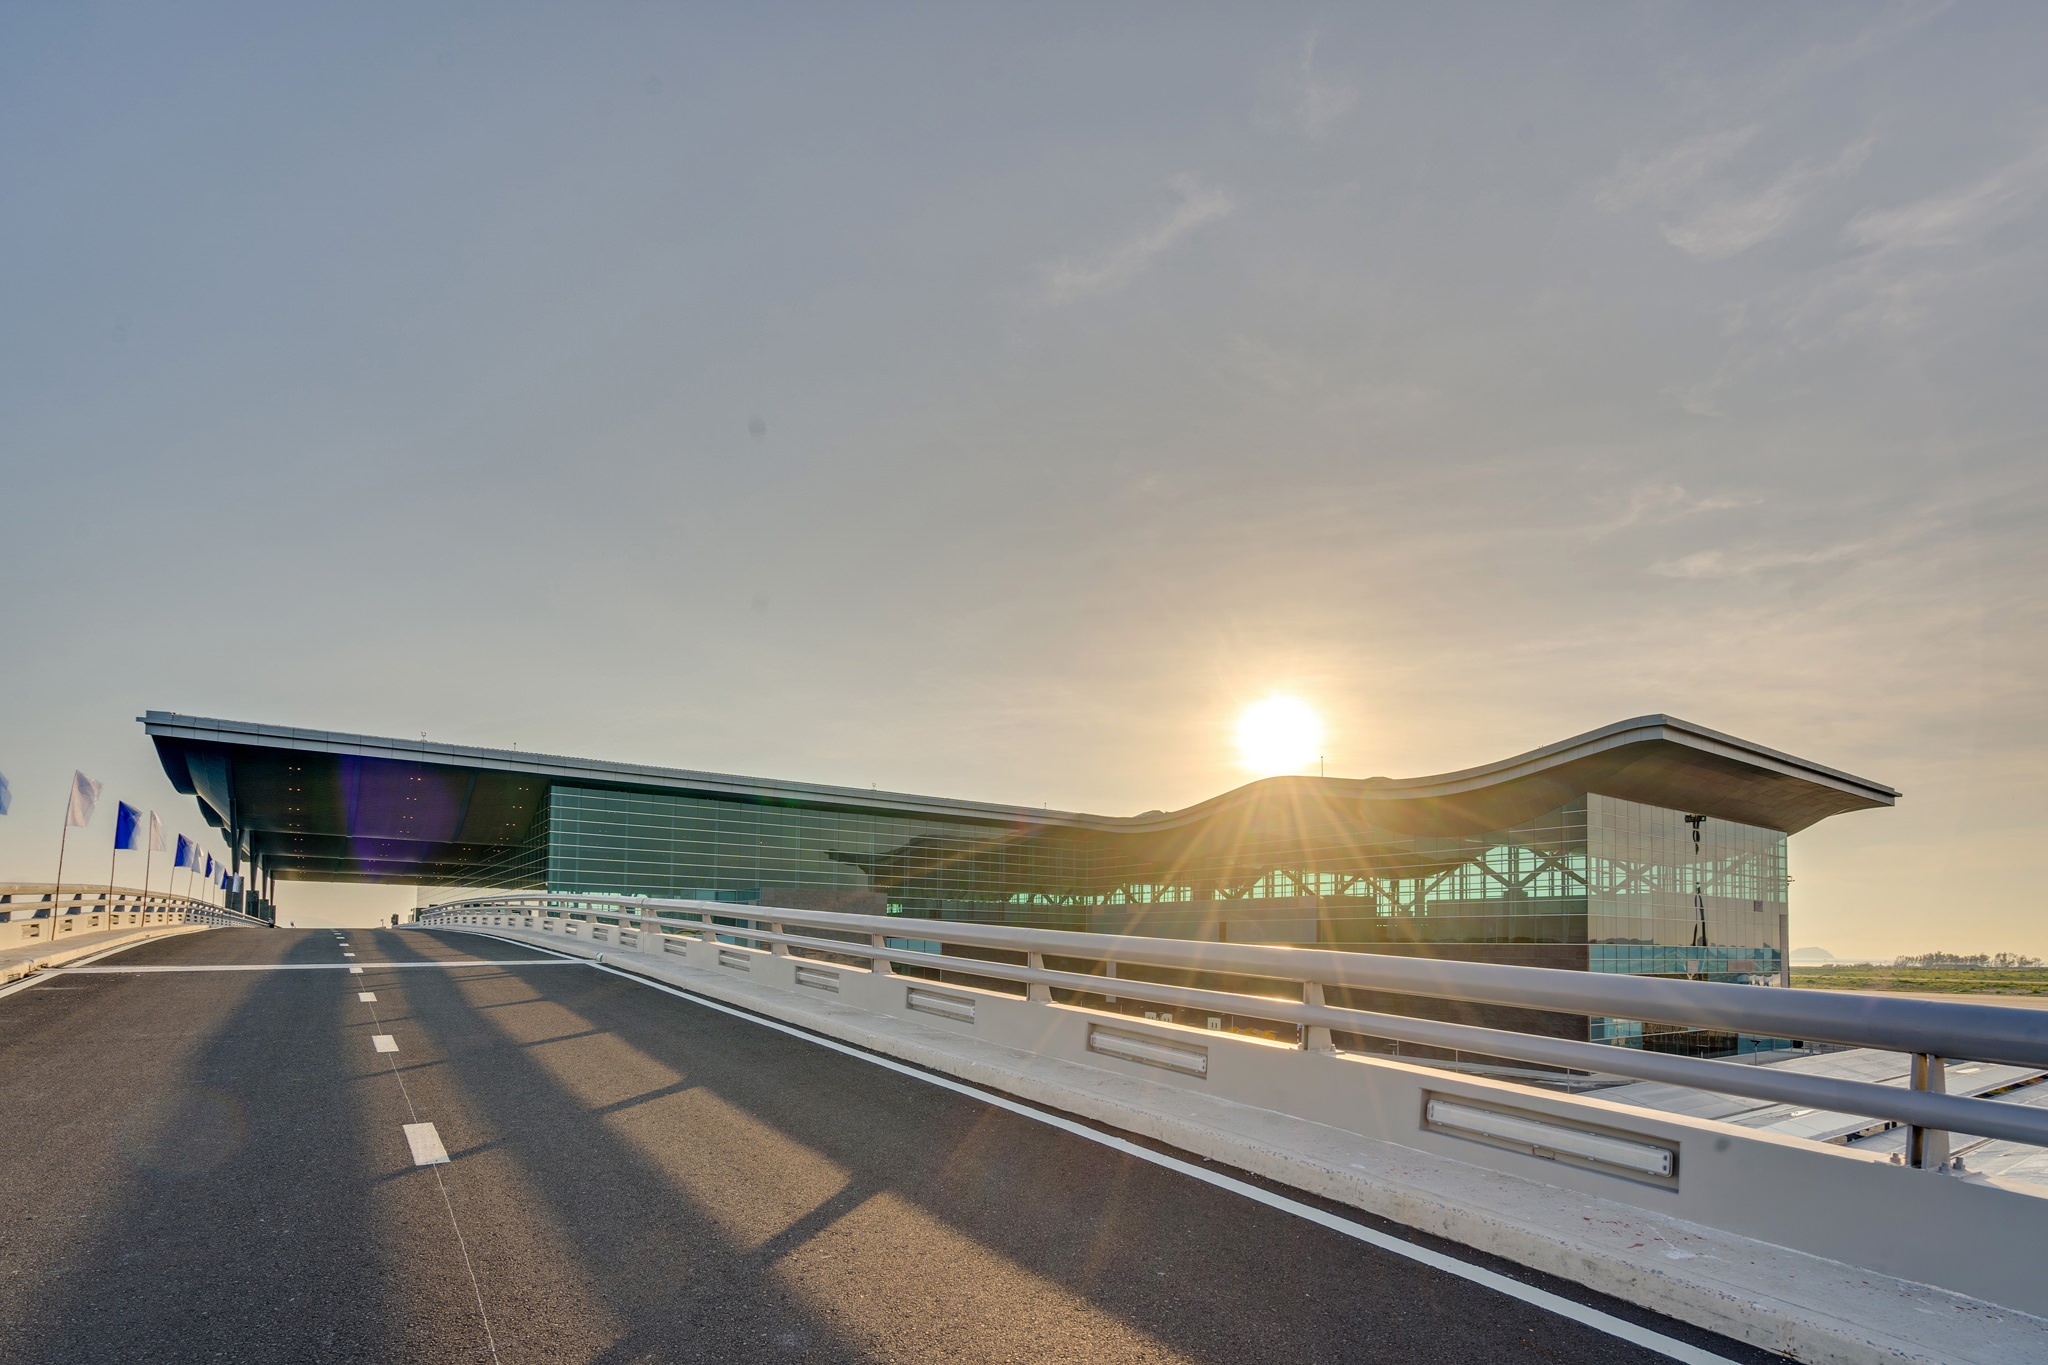 20180626 - Cam Ranh Airport - Architecture - 0104.jpg